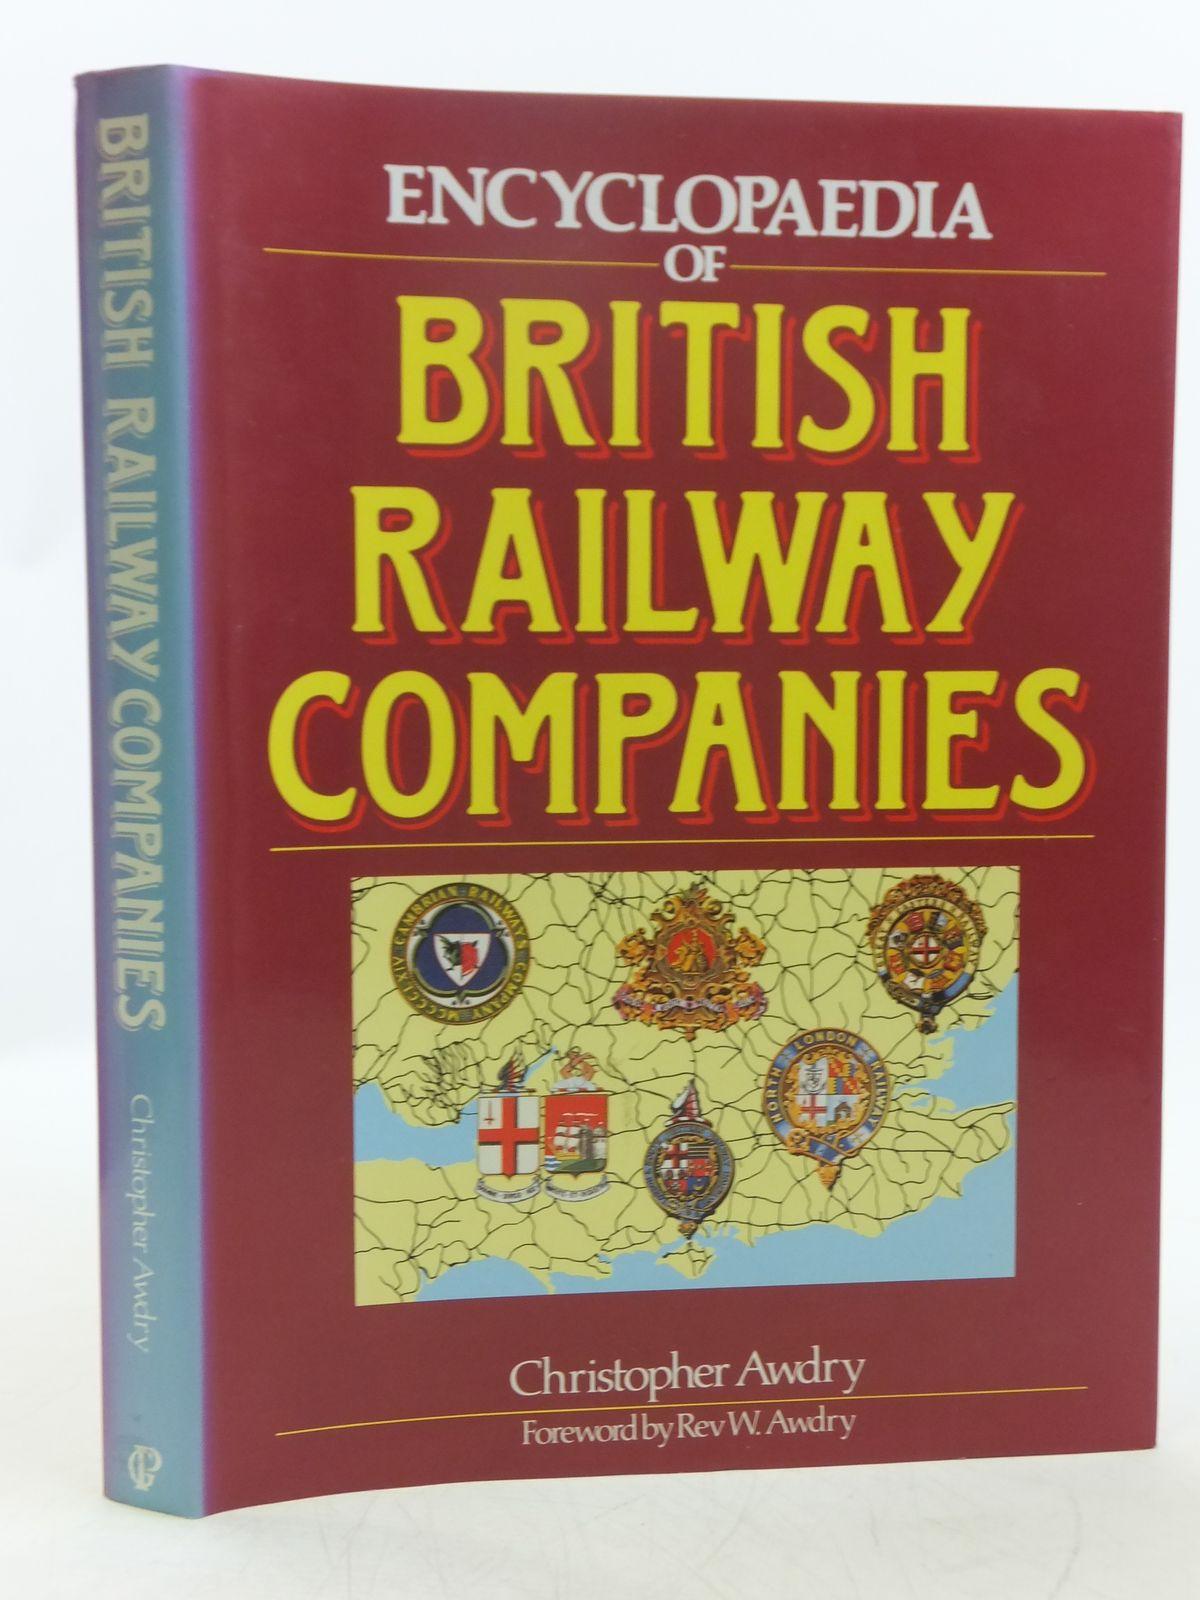 ENCYCLOPAEDIA OF BRITISH RAILWAY COMPANIES written by Awdry